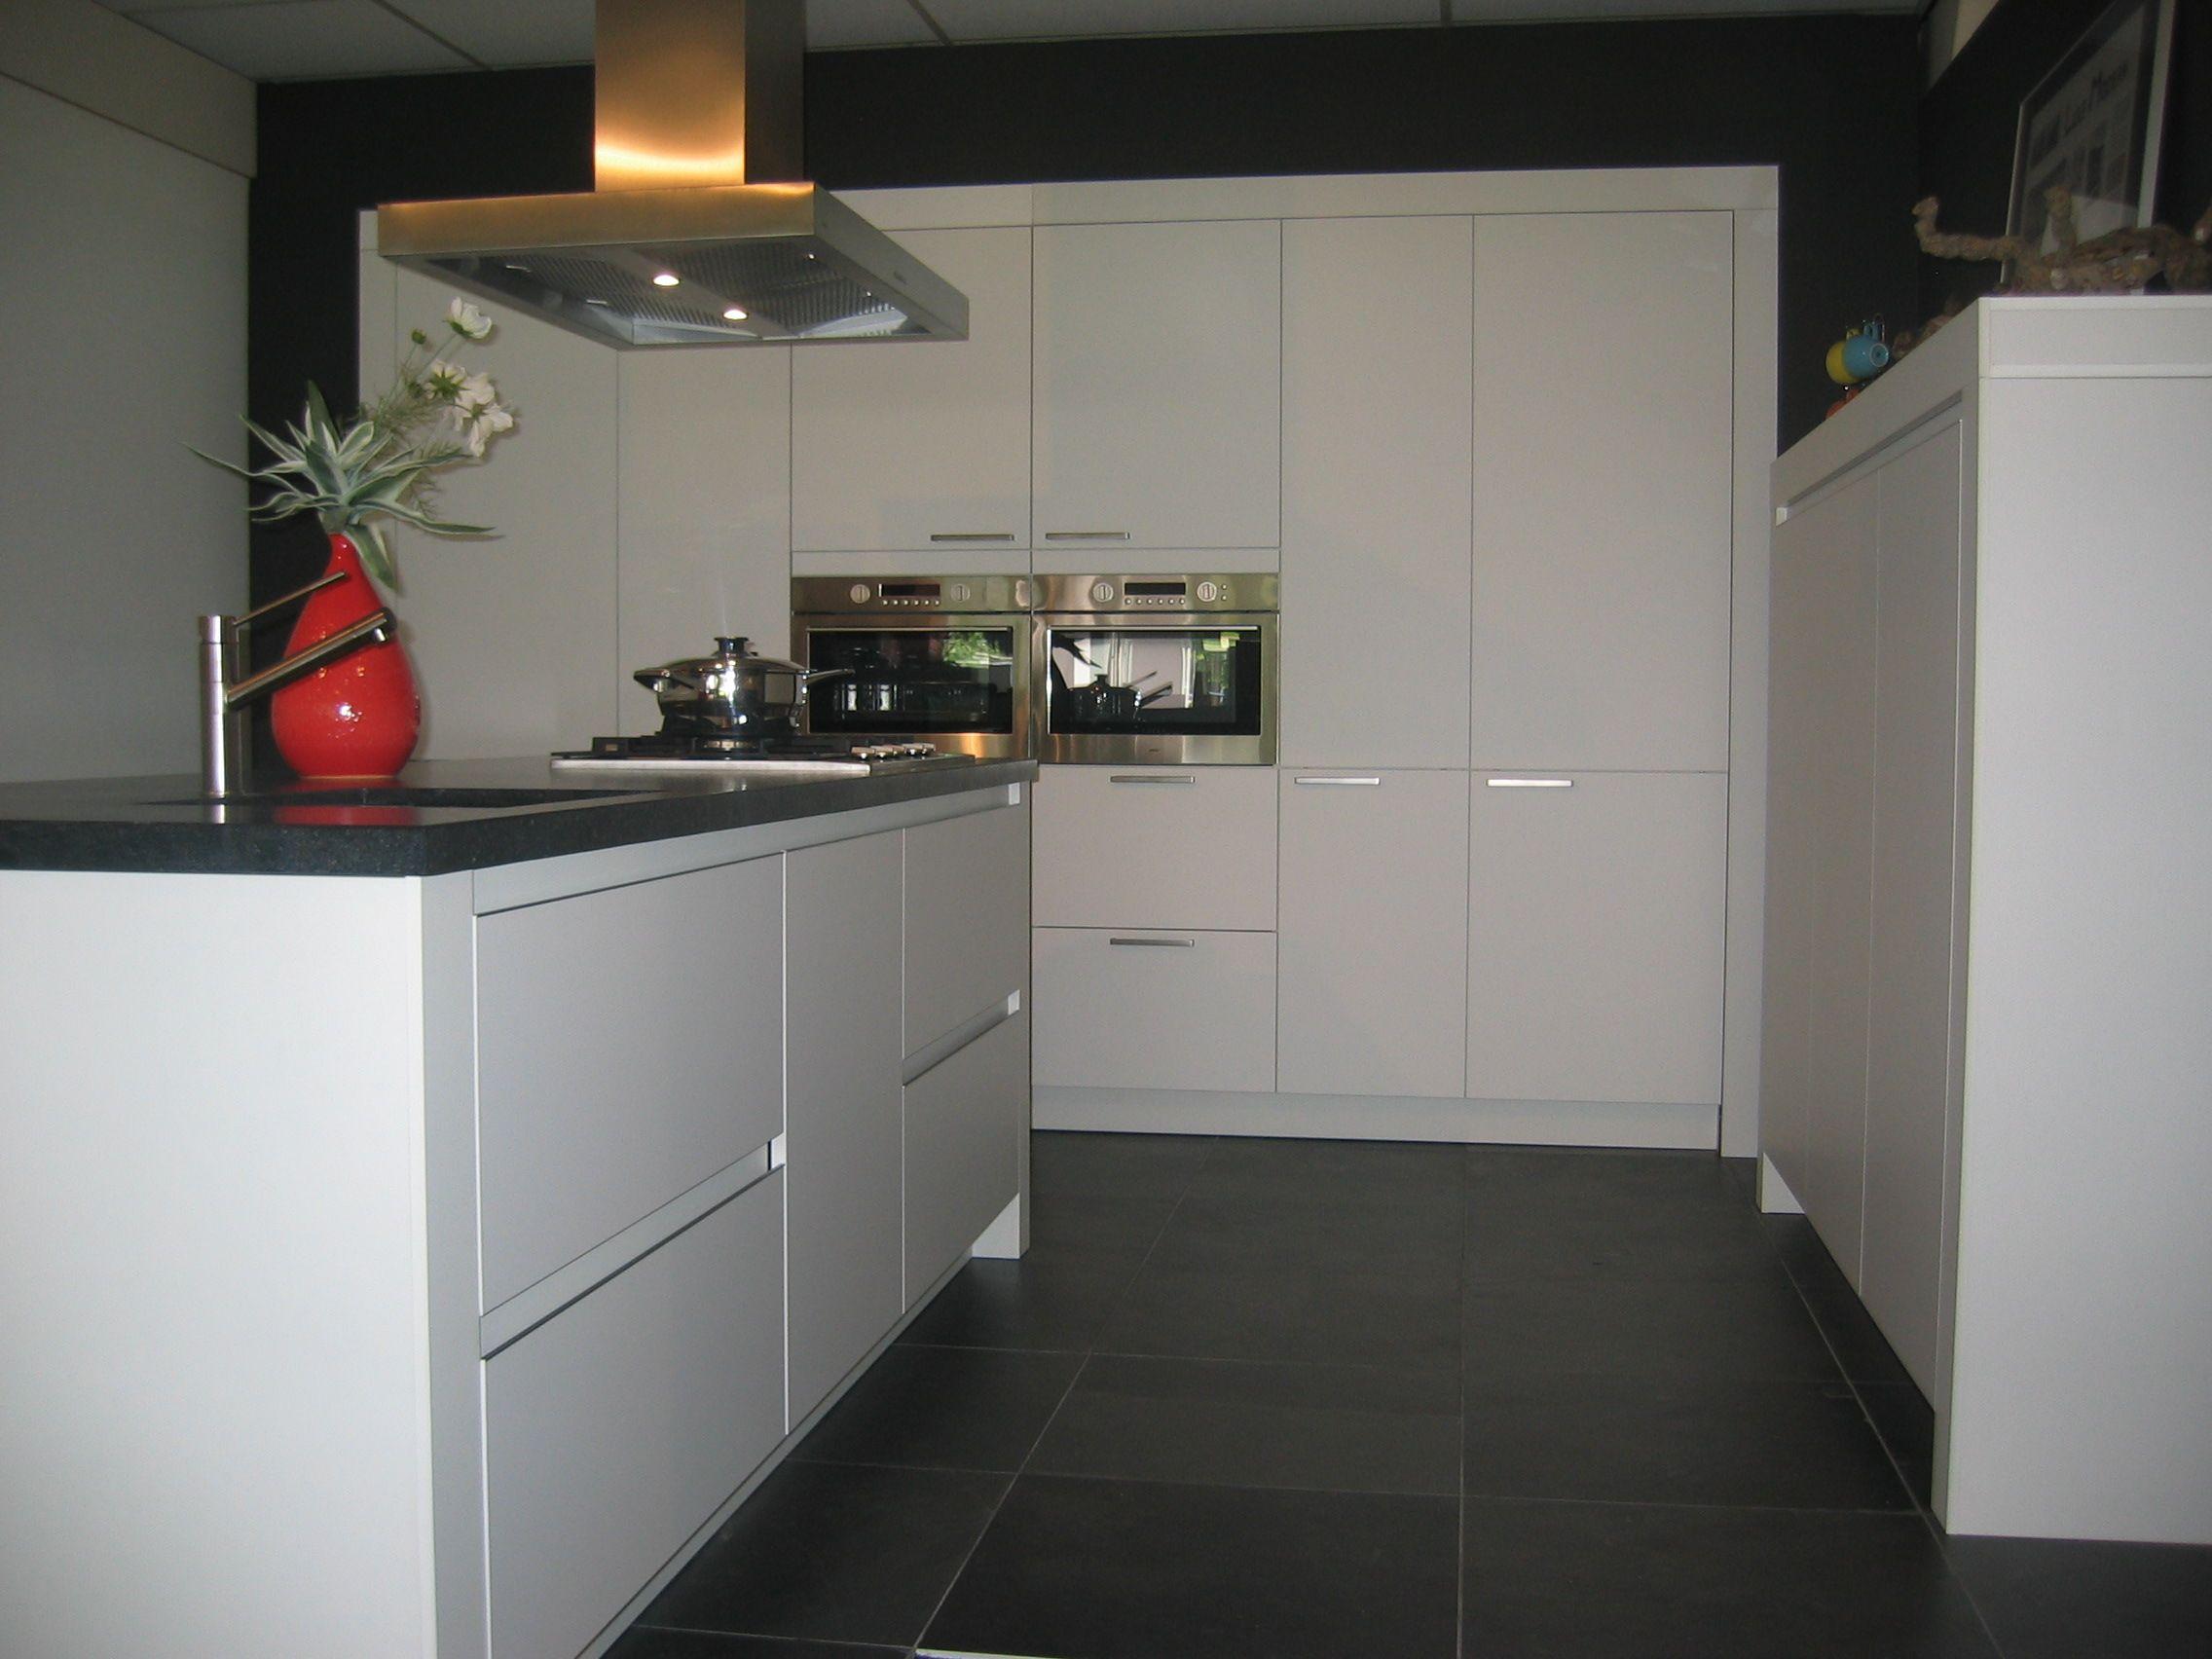 Greeploze Witte Keuken : Keukentrack allergrootste keukensite van nederland